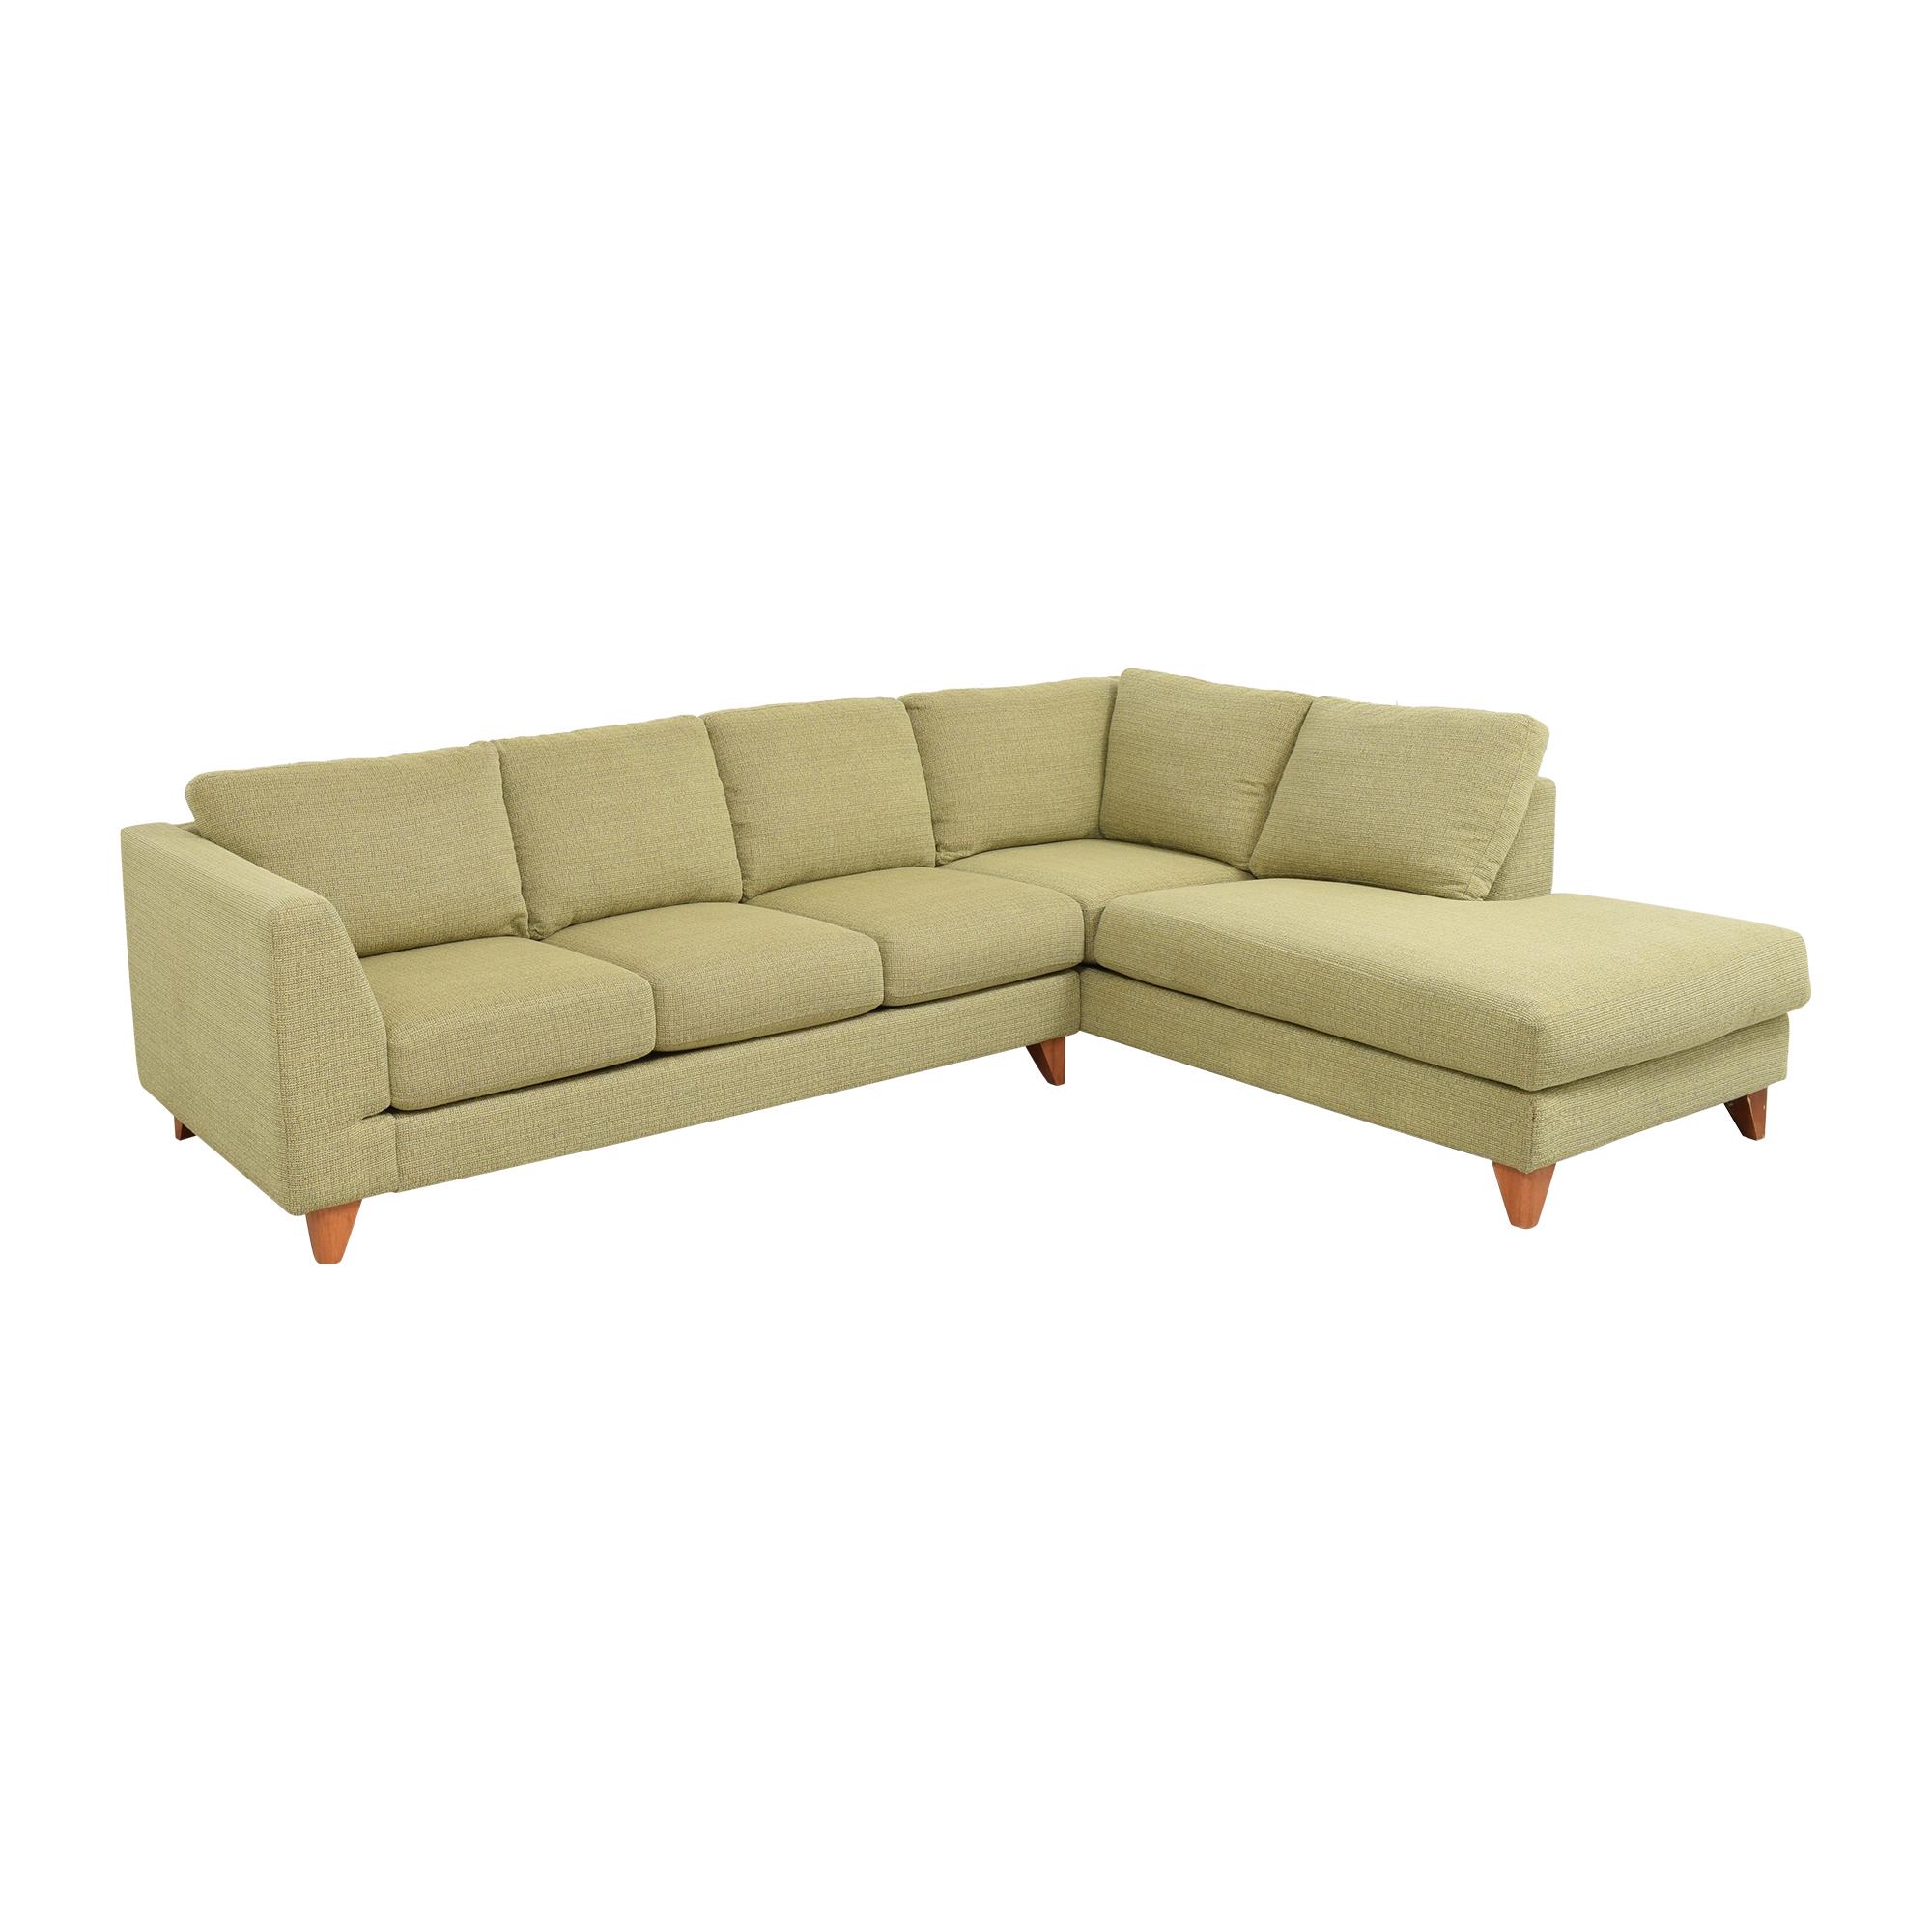 Jaymar Jaymar Chaise Sectional Sofa Sectionals